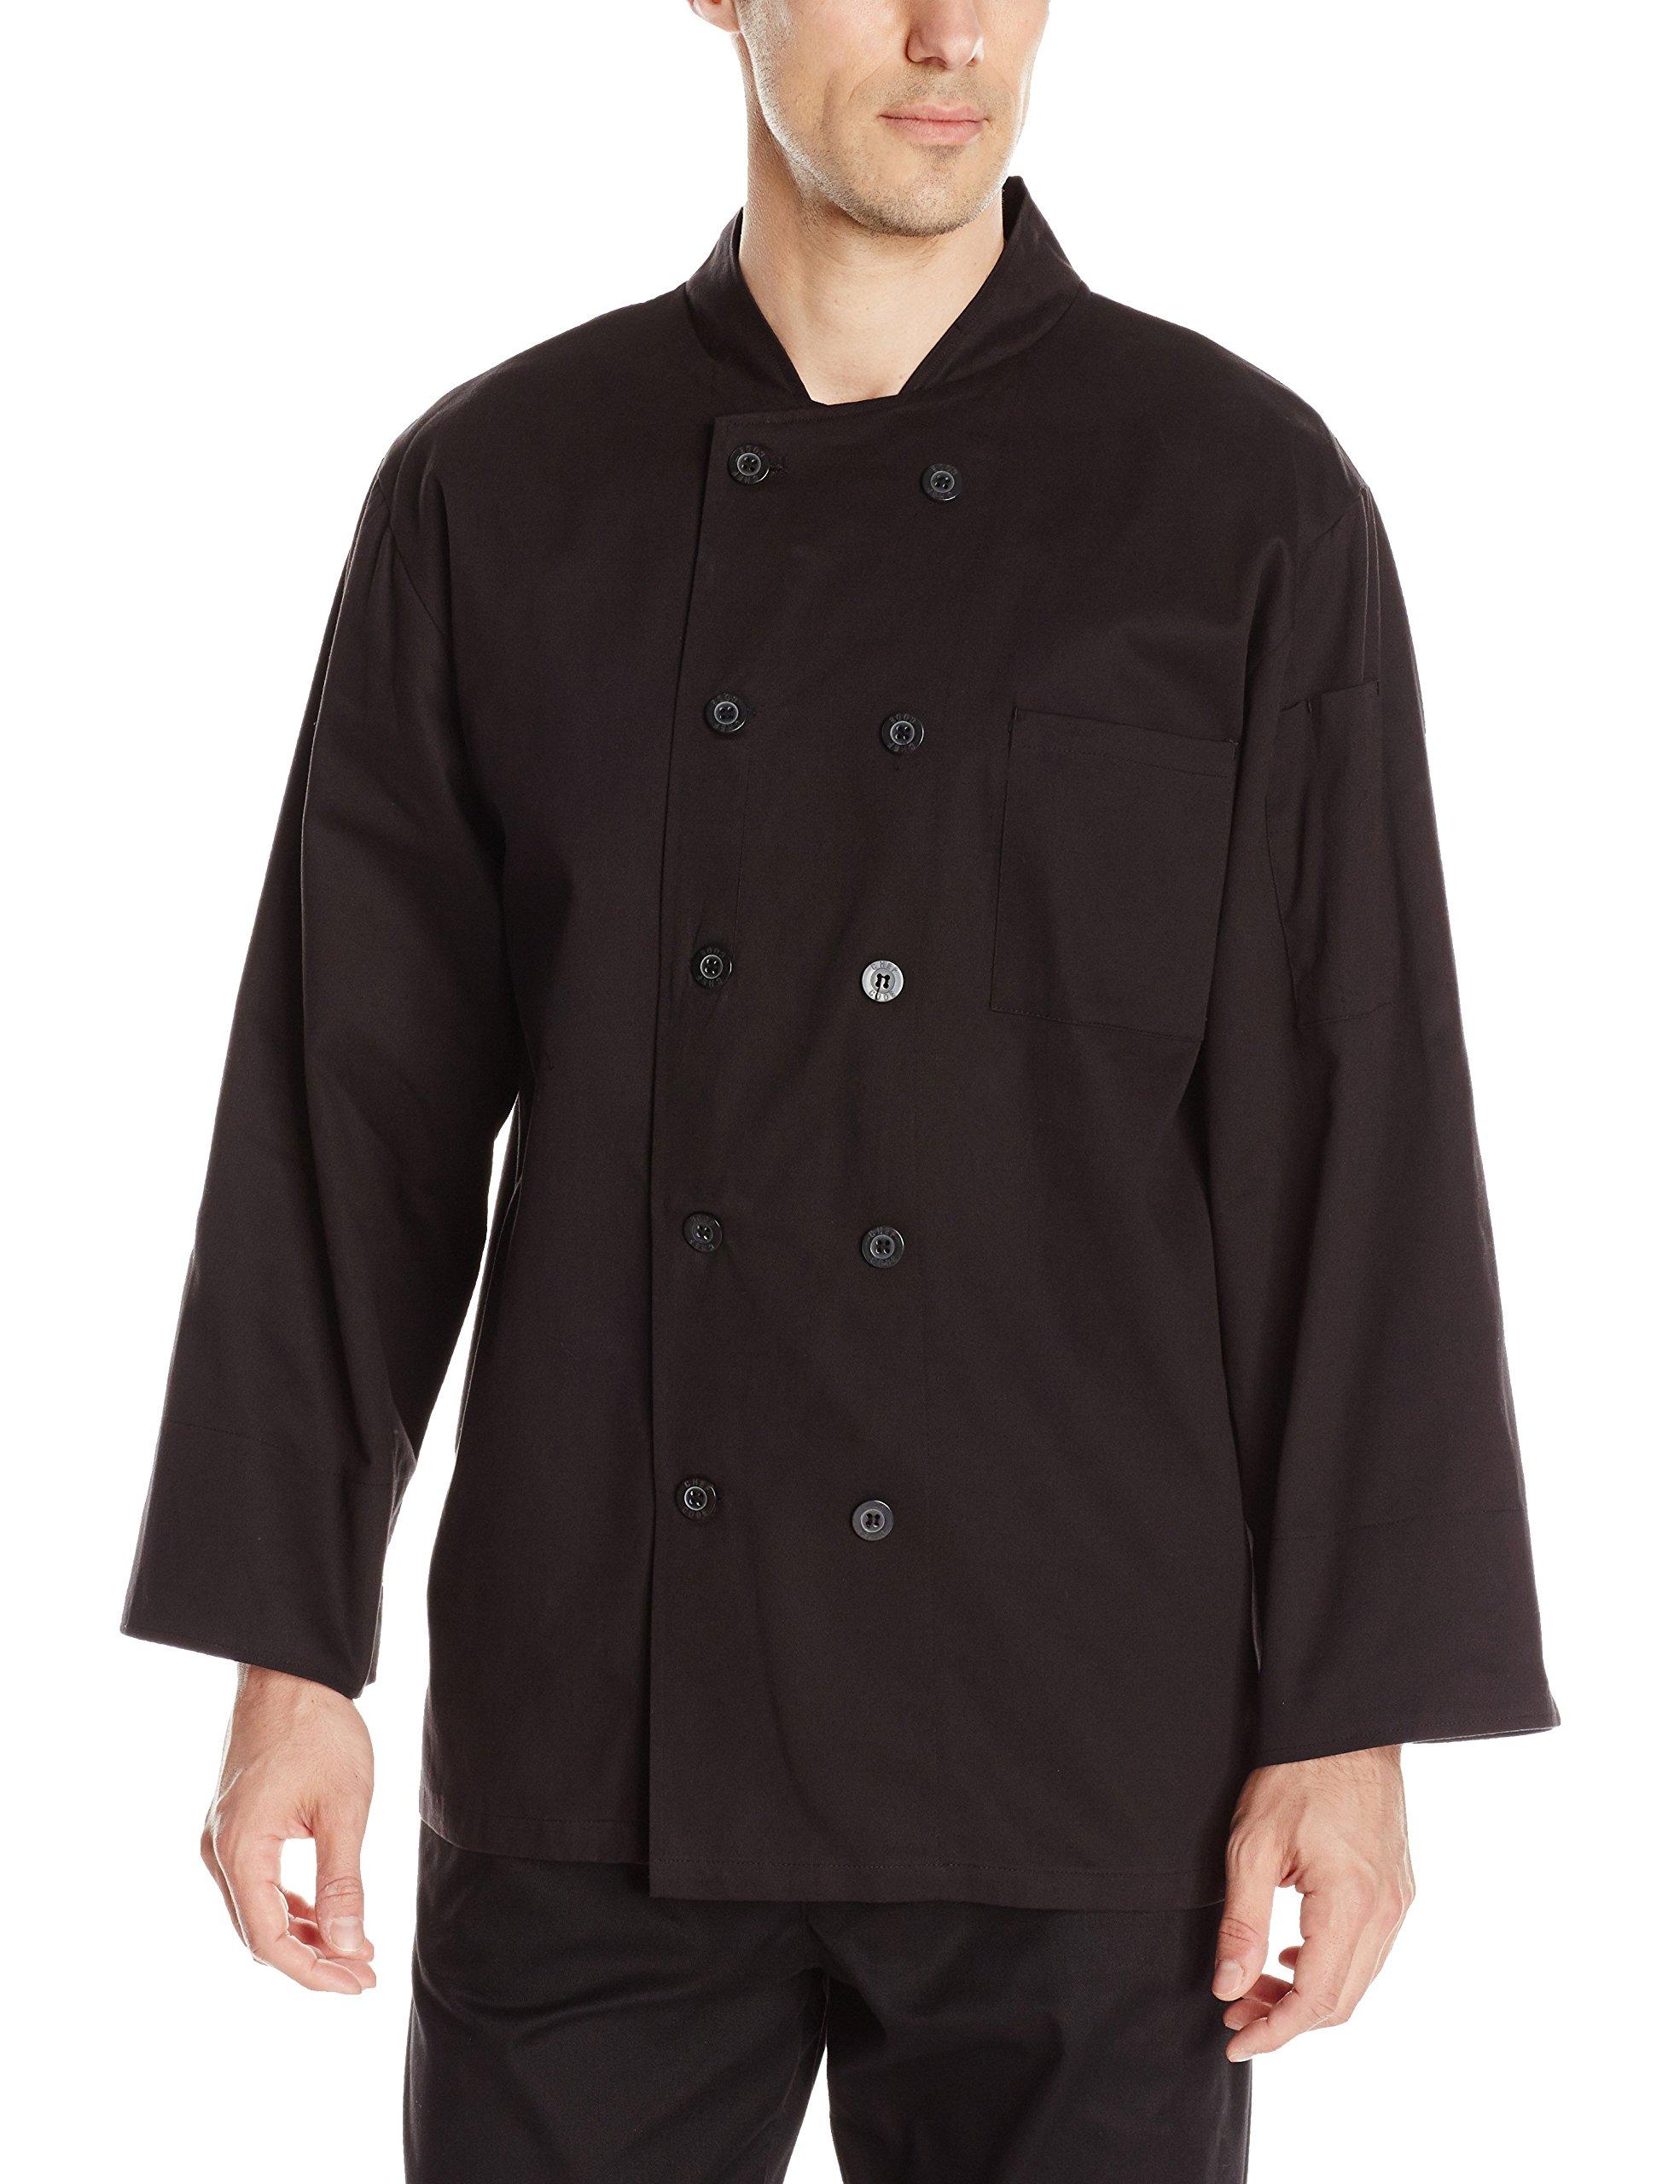 Chef Code Men's Classic 100% Premium Cotton Long Sleeve Coat, Black, X-Large